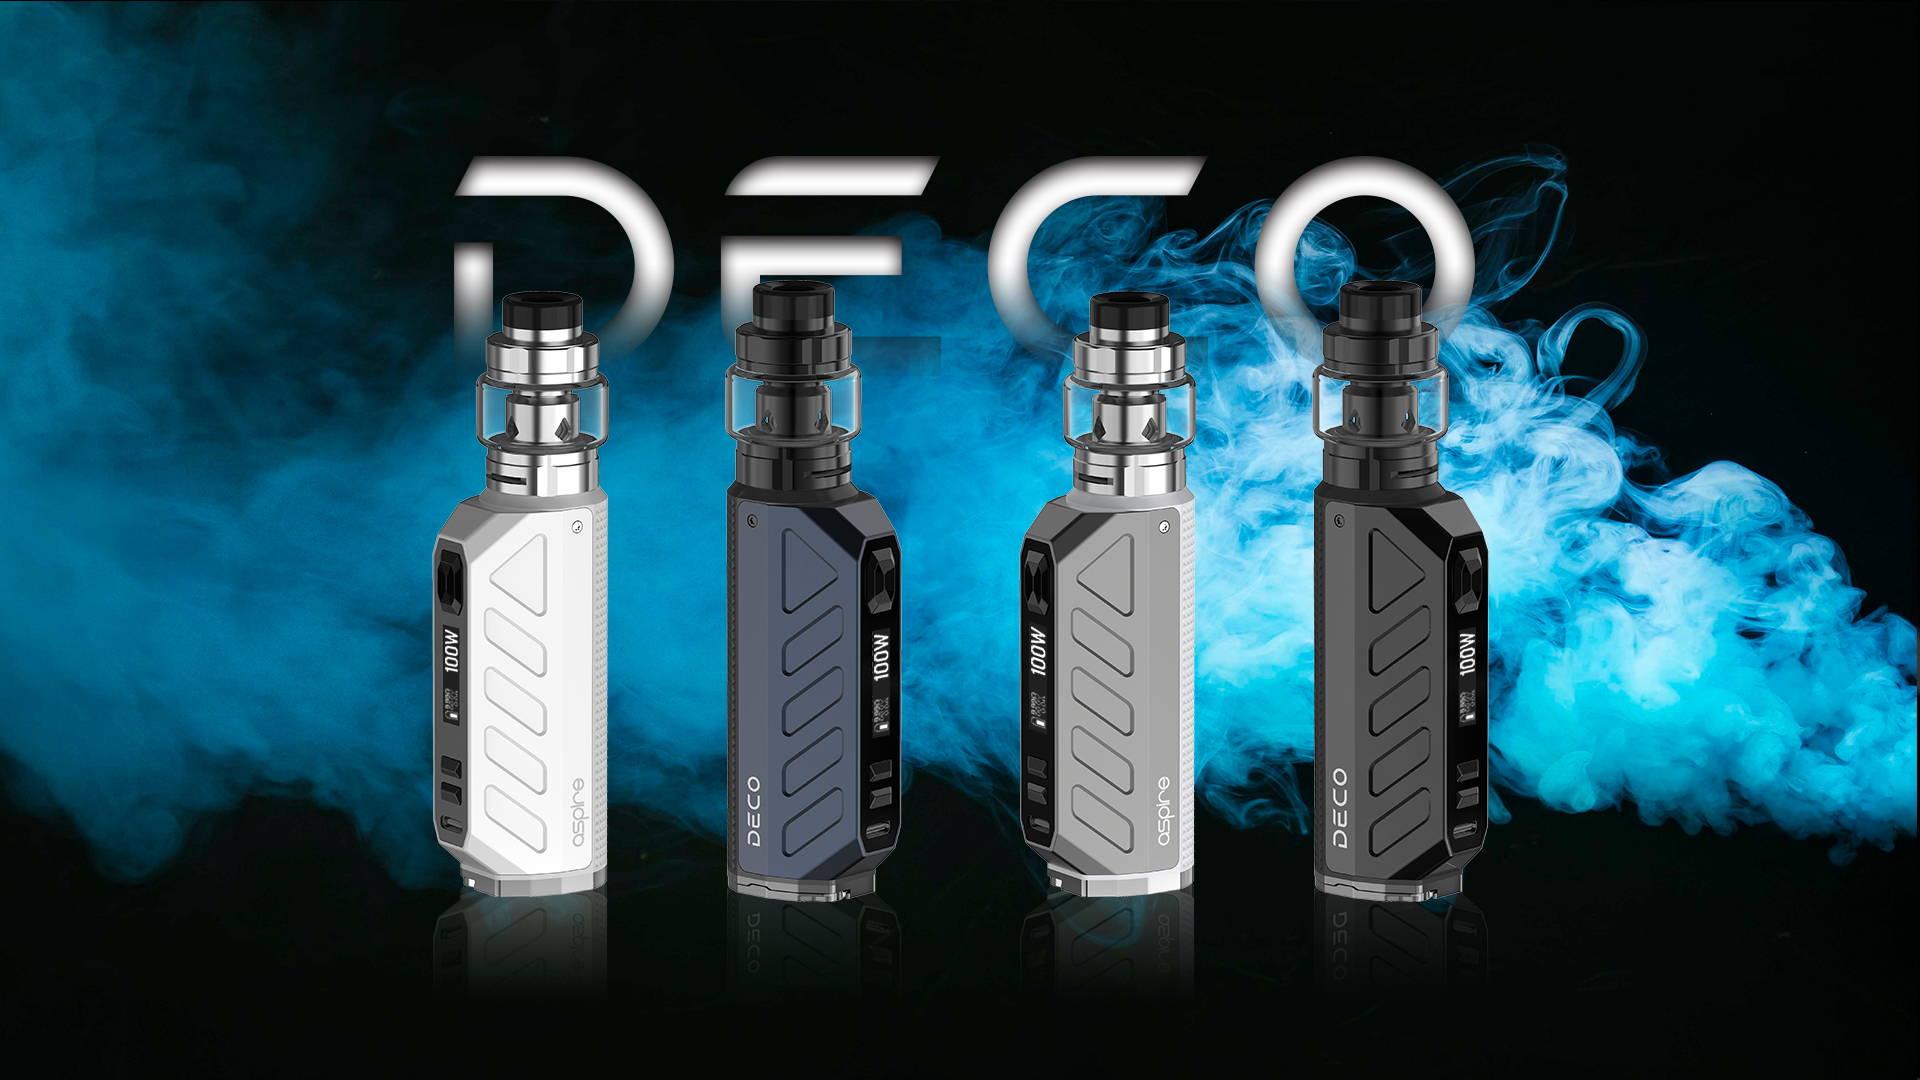 Aspire Deco 100w 18650 / 21700 Regulated Subohm Kit - UK Aspire Vendor